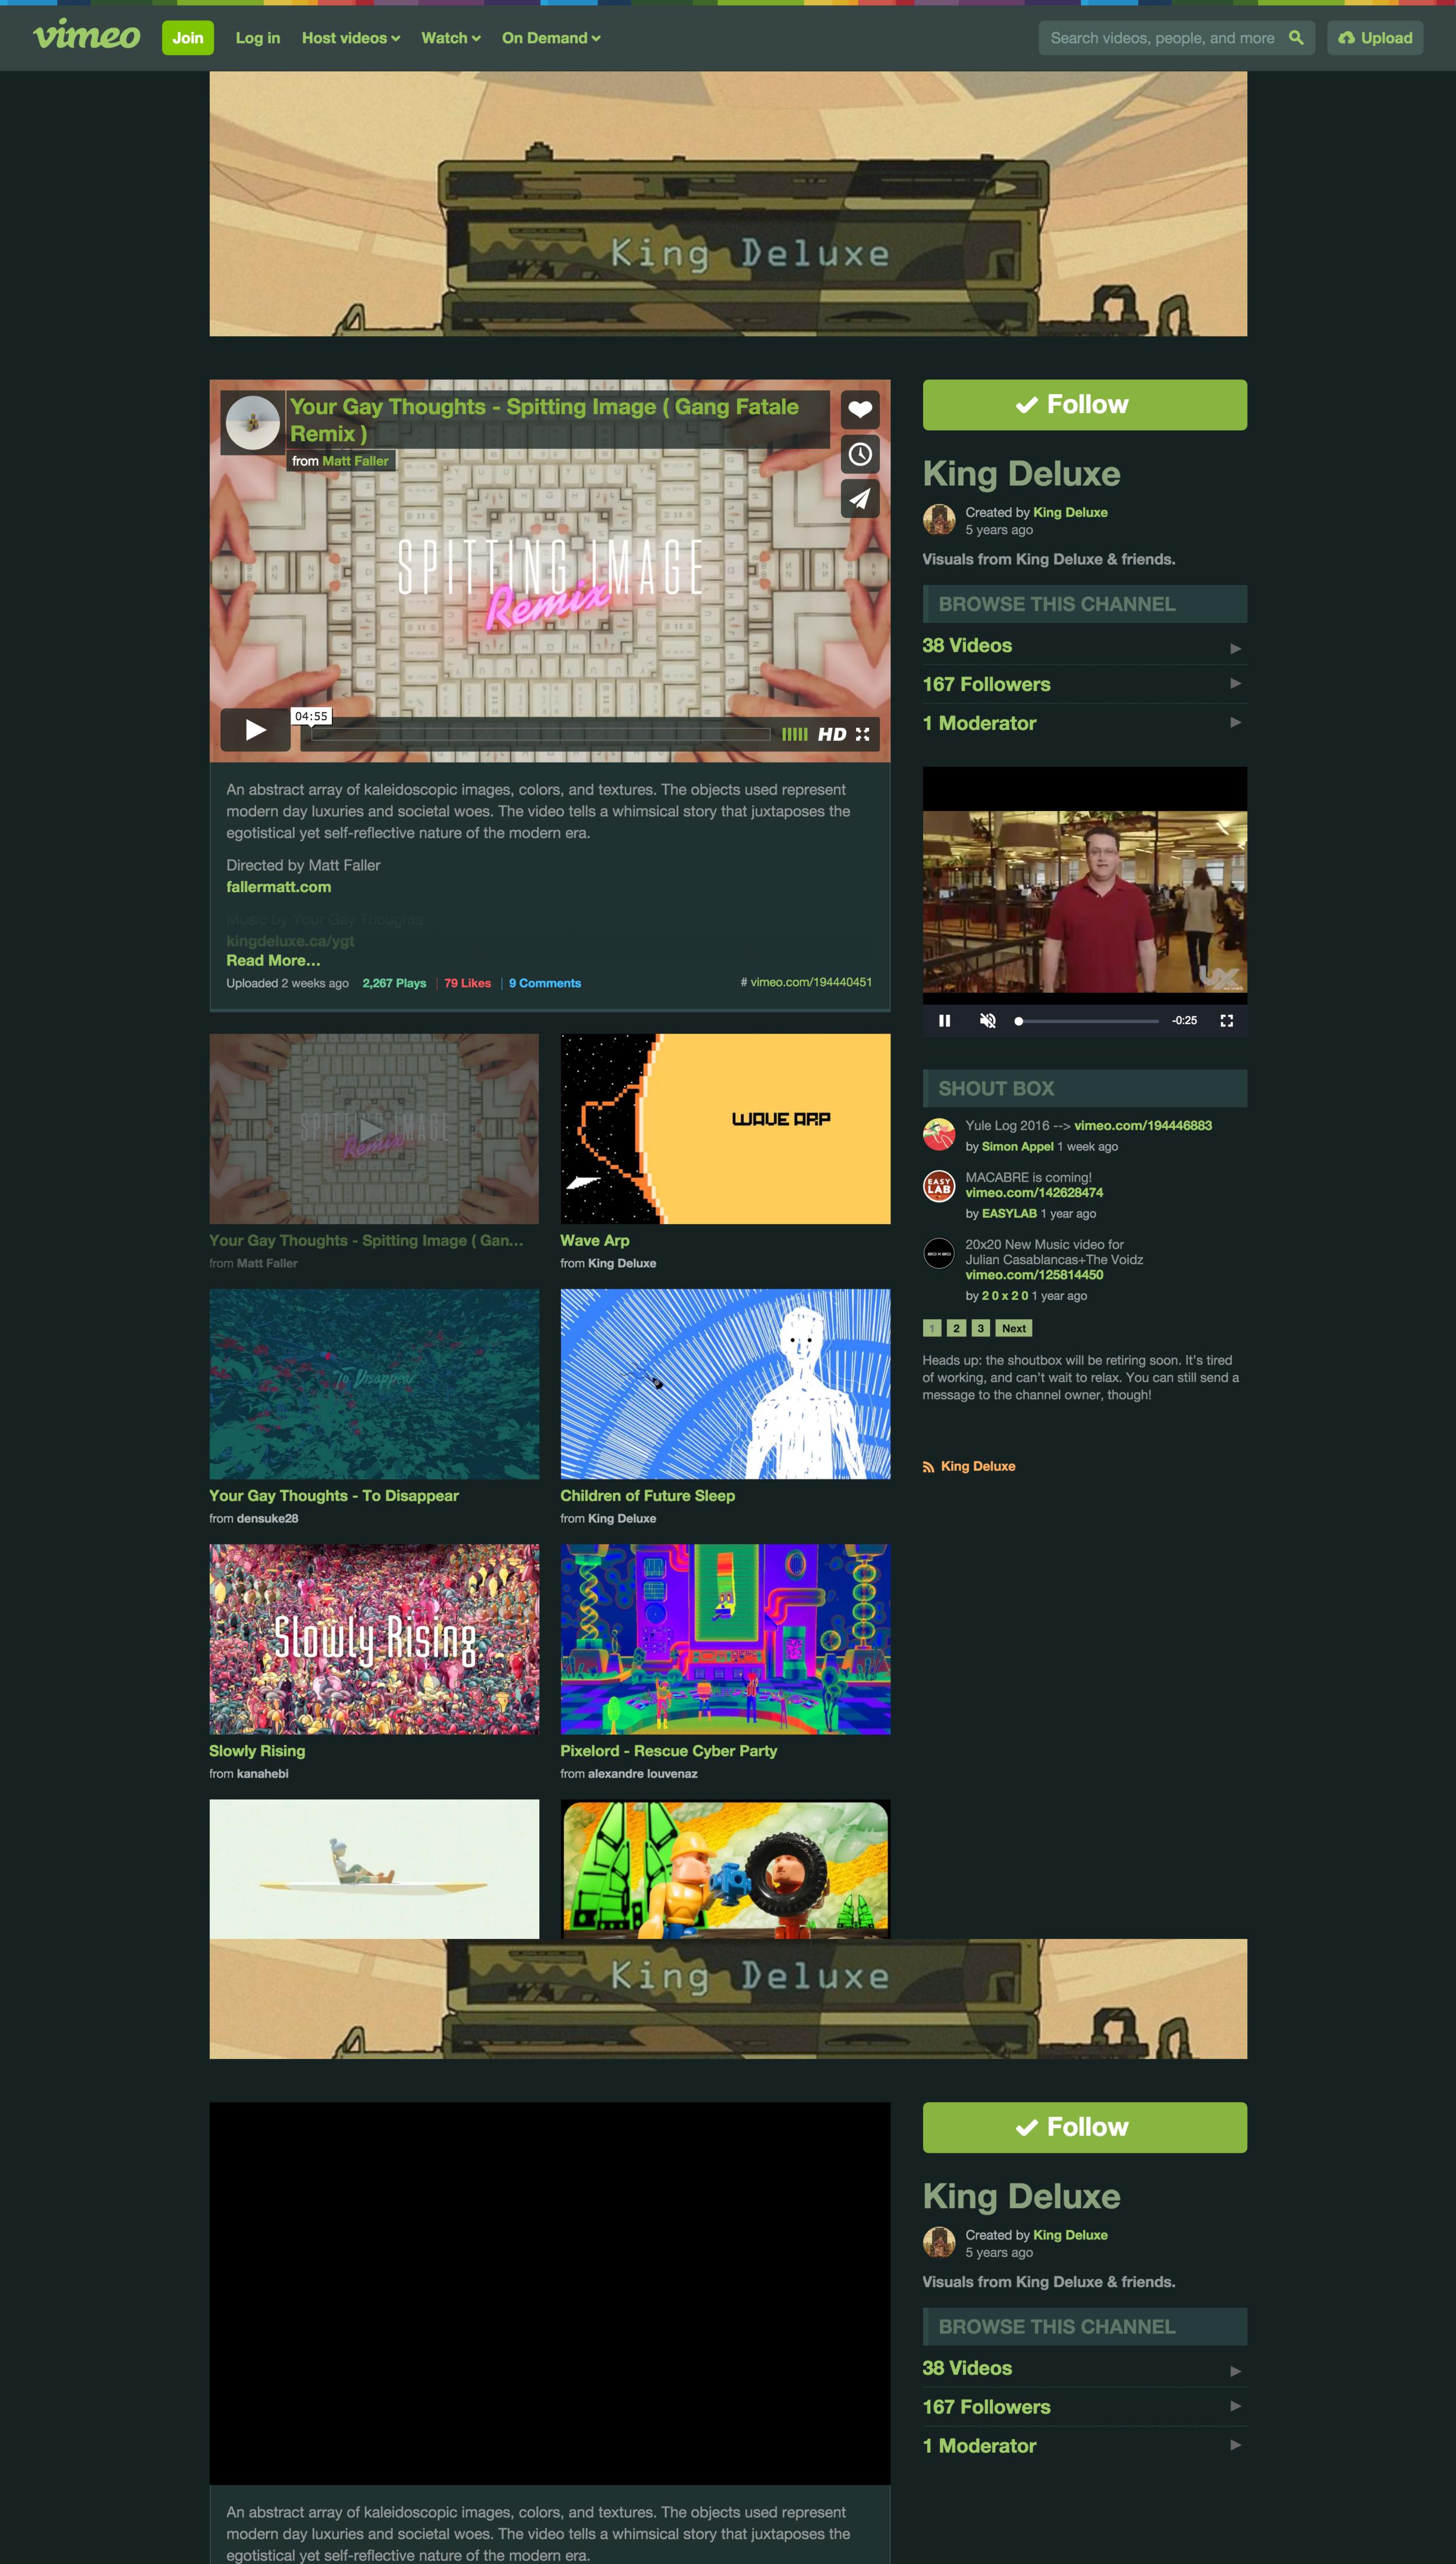 screencapture-vimeo-channels-kingdeluxe-1482073343436.png